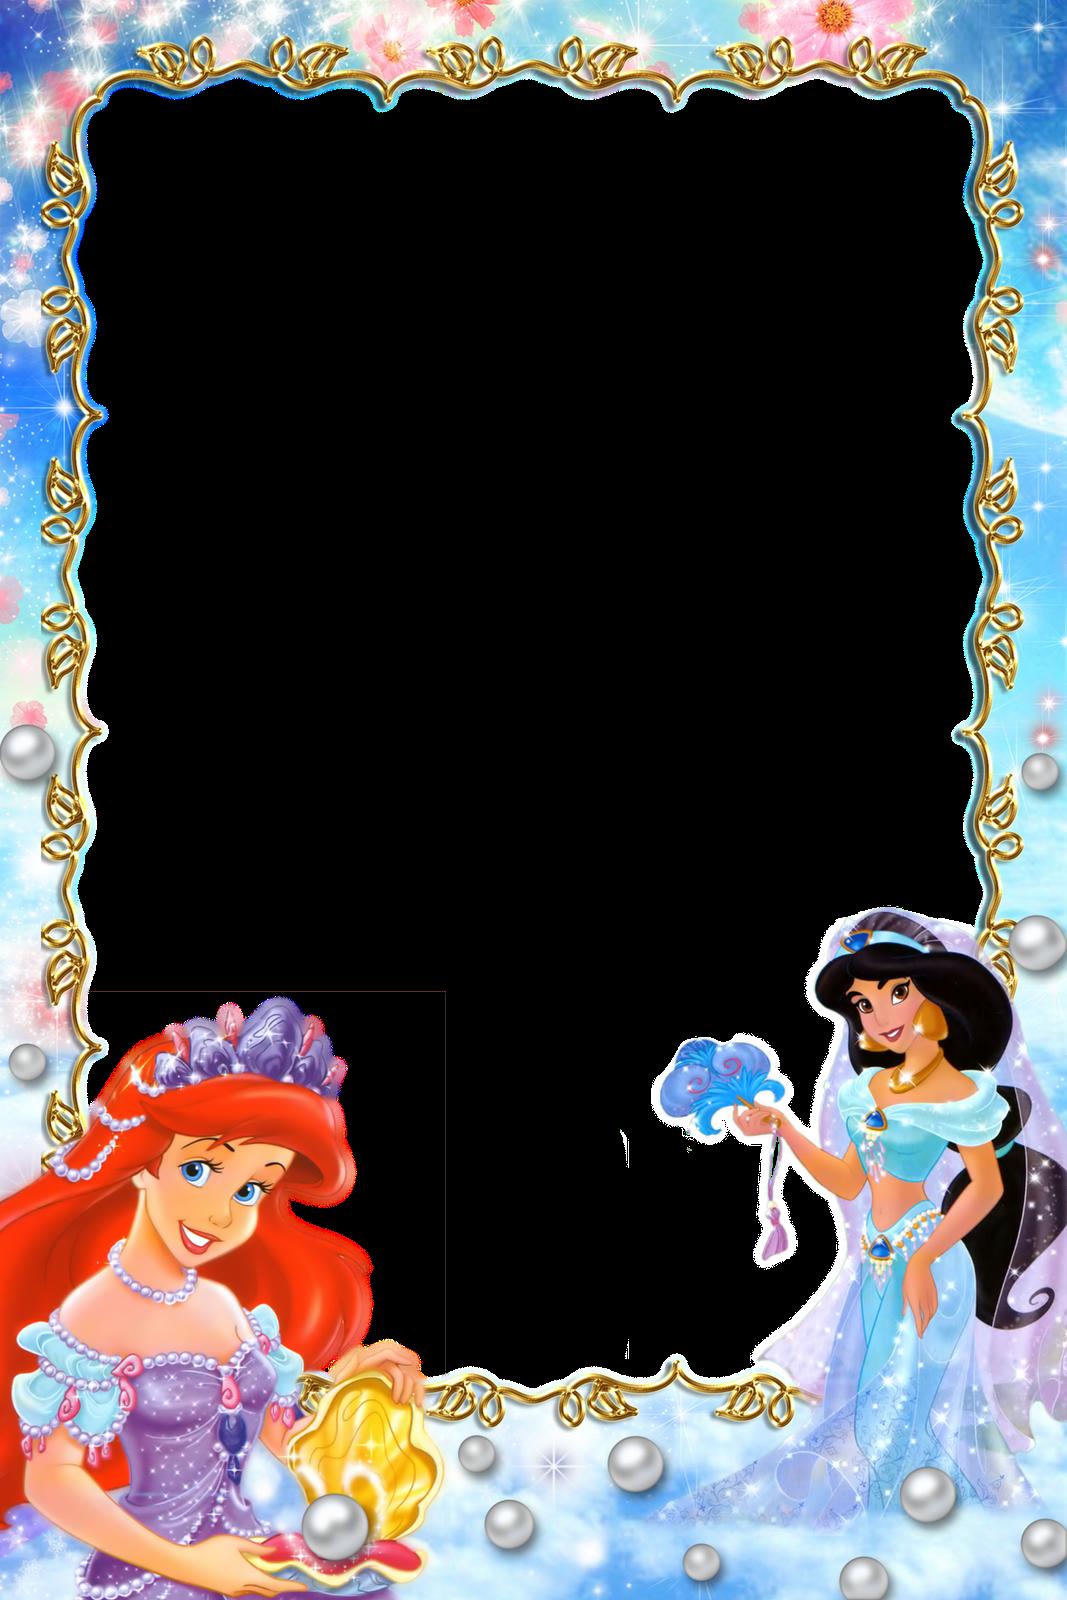 Frame clipart mermaid. Imagens para photoshop princesas